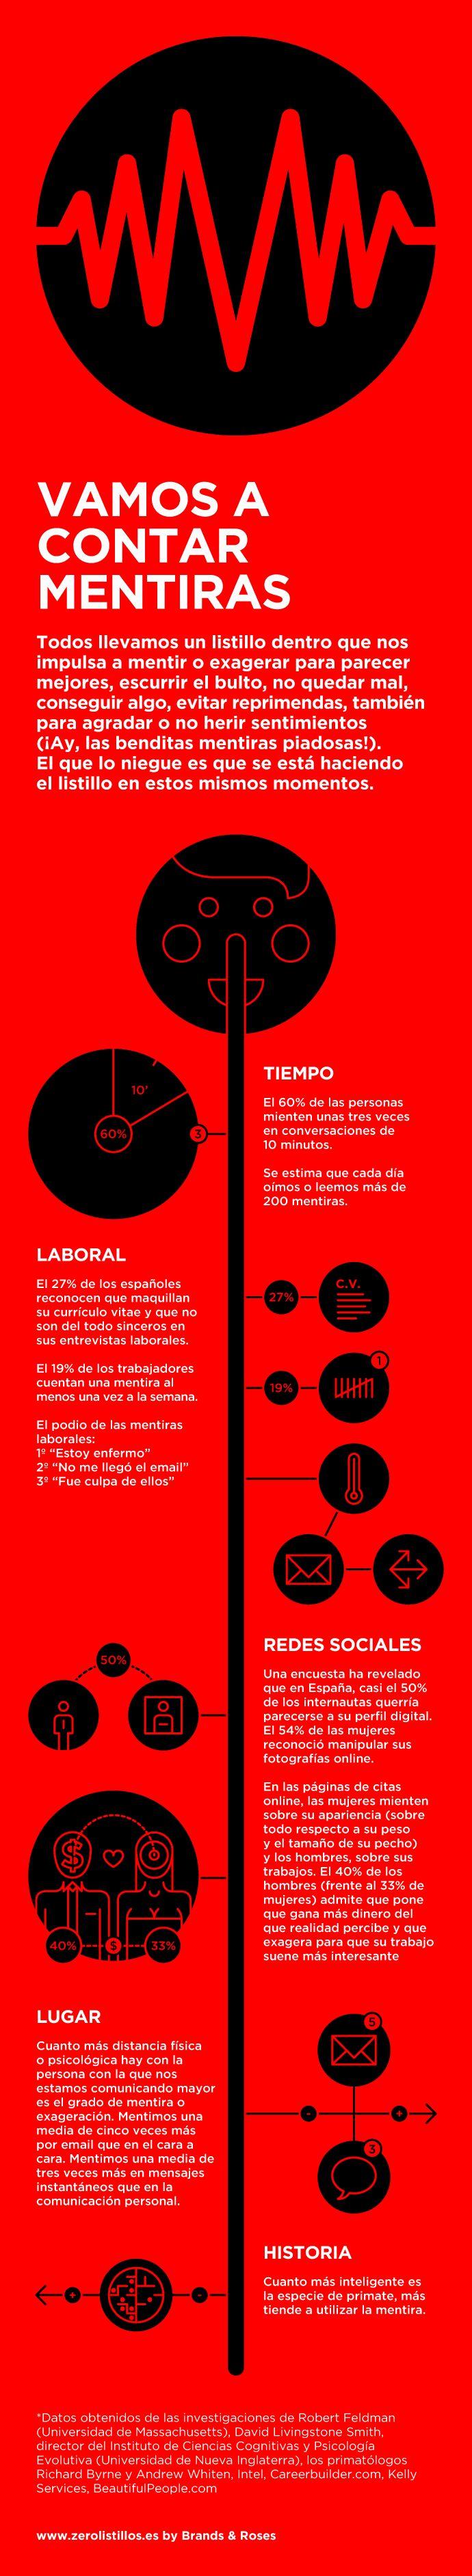 Todo sobre las mentiras #infografia #infographic